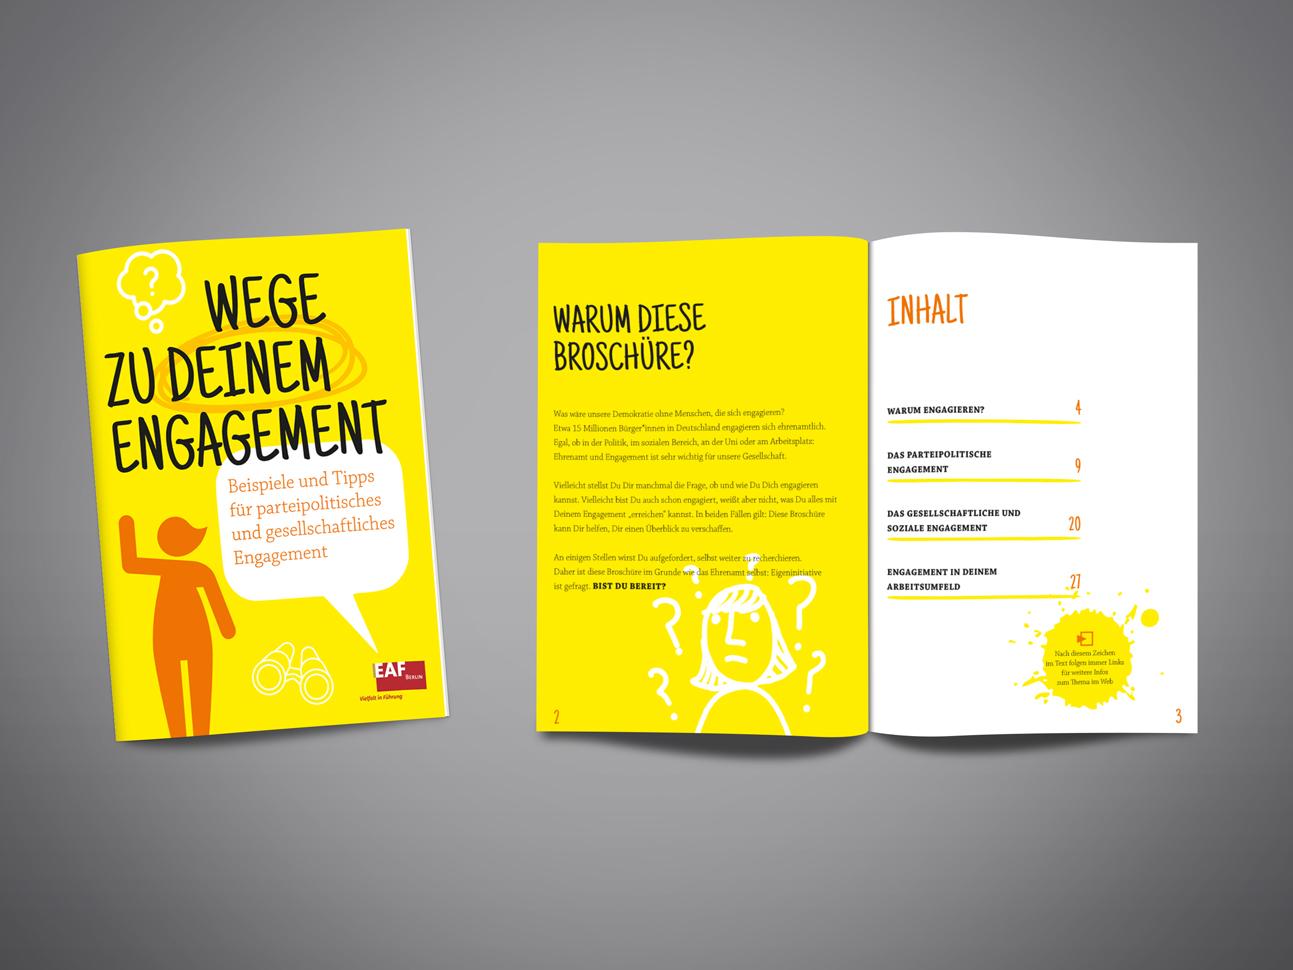 martin zech design, projekt design, dein engagement, titel, doppelseite